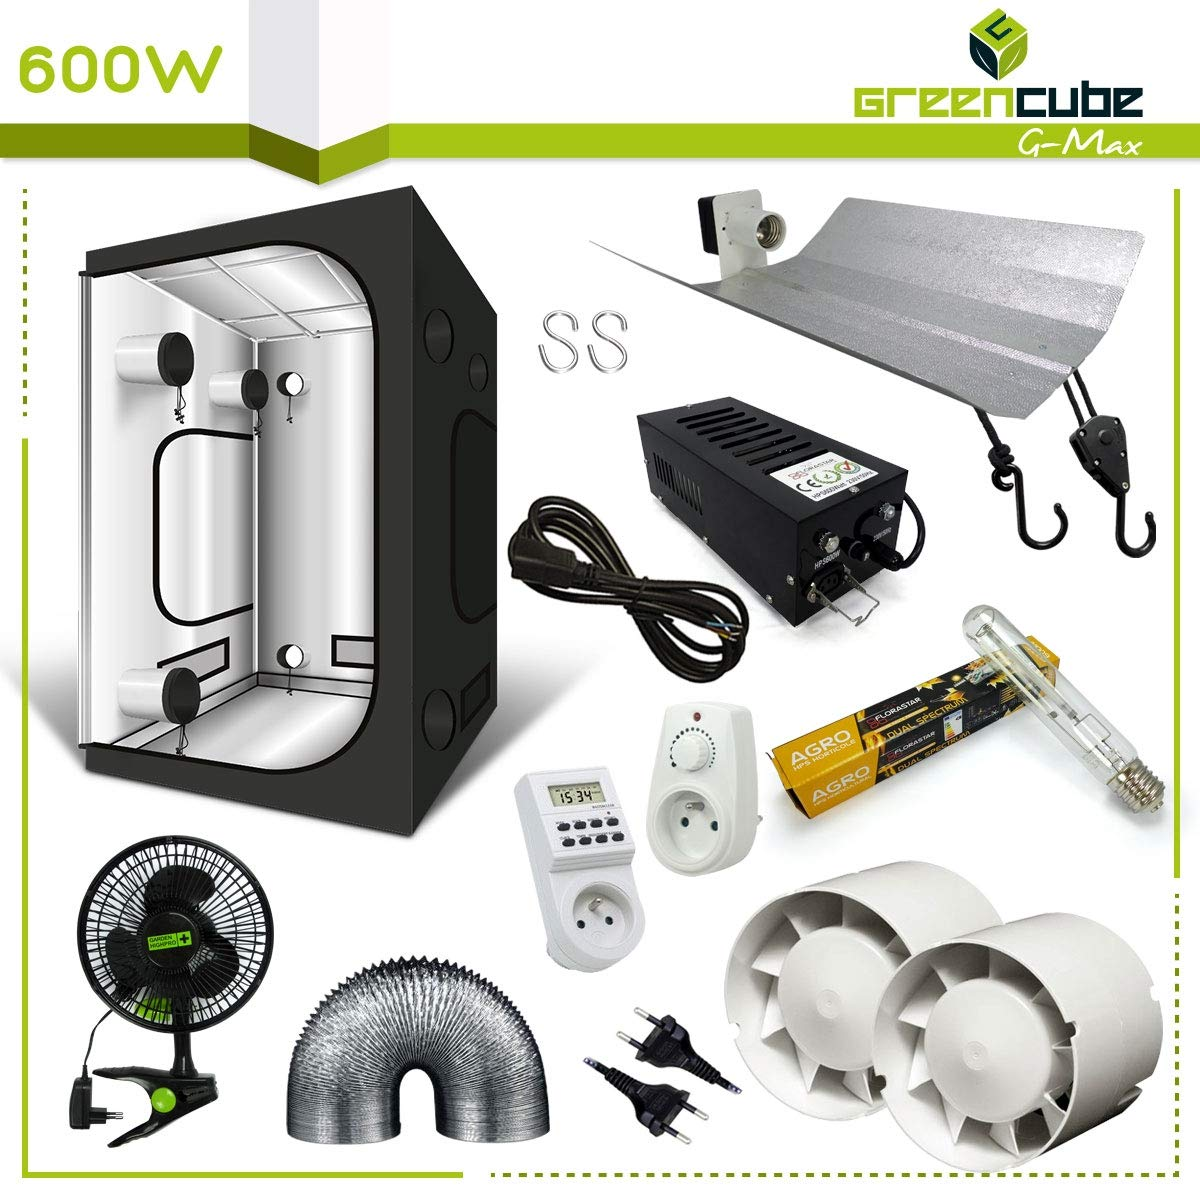 Pack Box 600W G-Max 150 Black Box HPS Hortilight